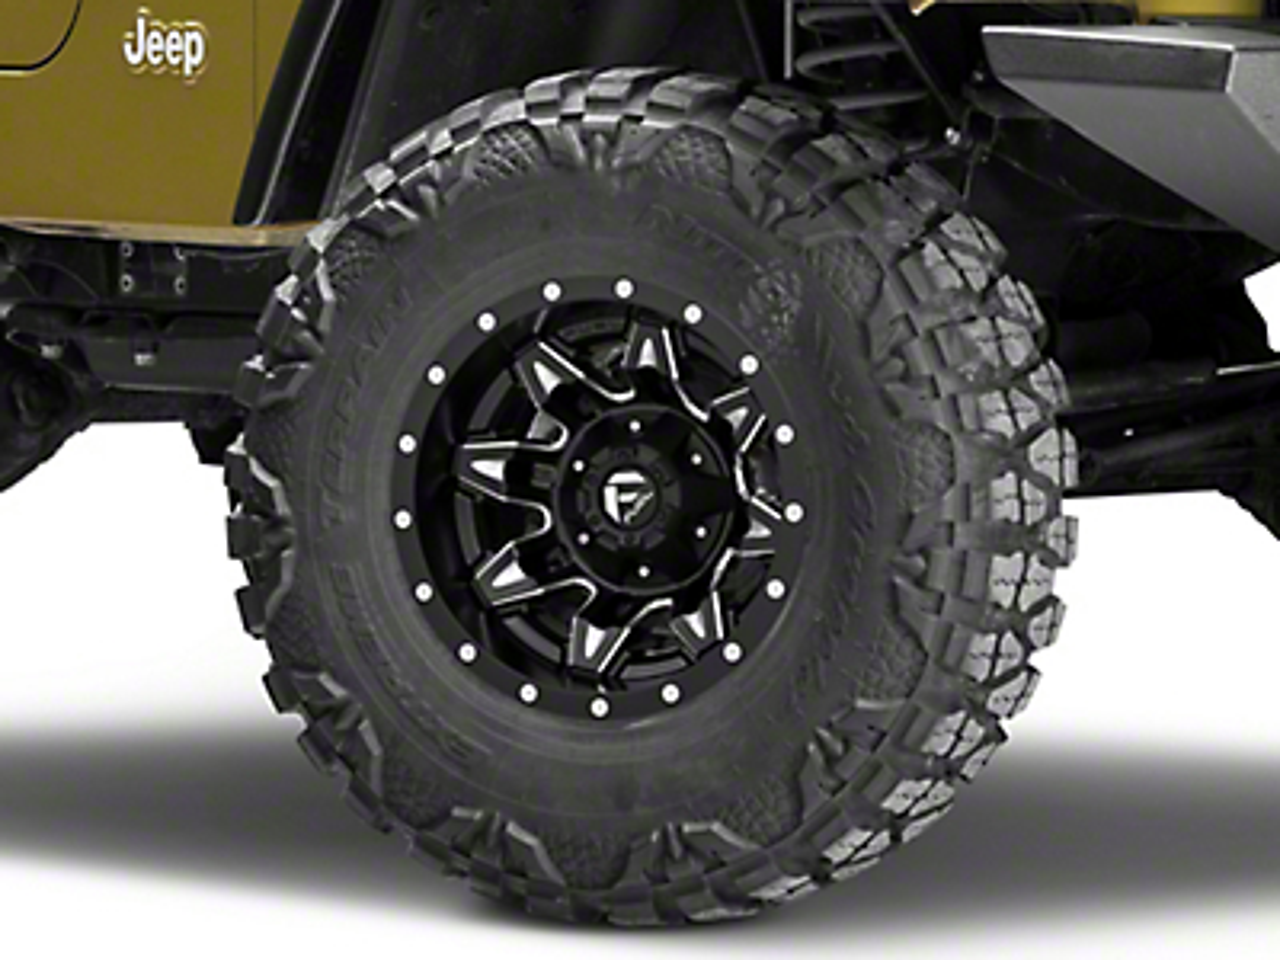 Fuel Wheels Lethal Matte Black Milled Wheel - 15x10 (87-06 Wrangler YJ & TJ)